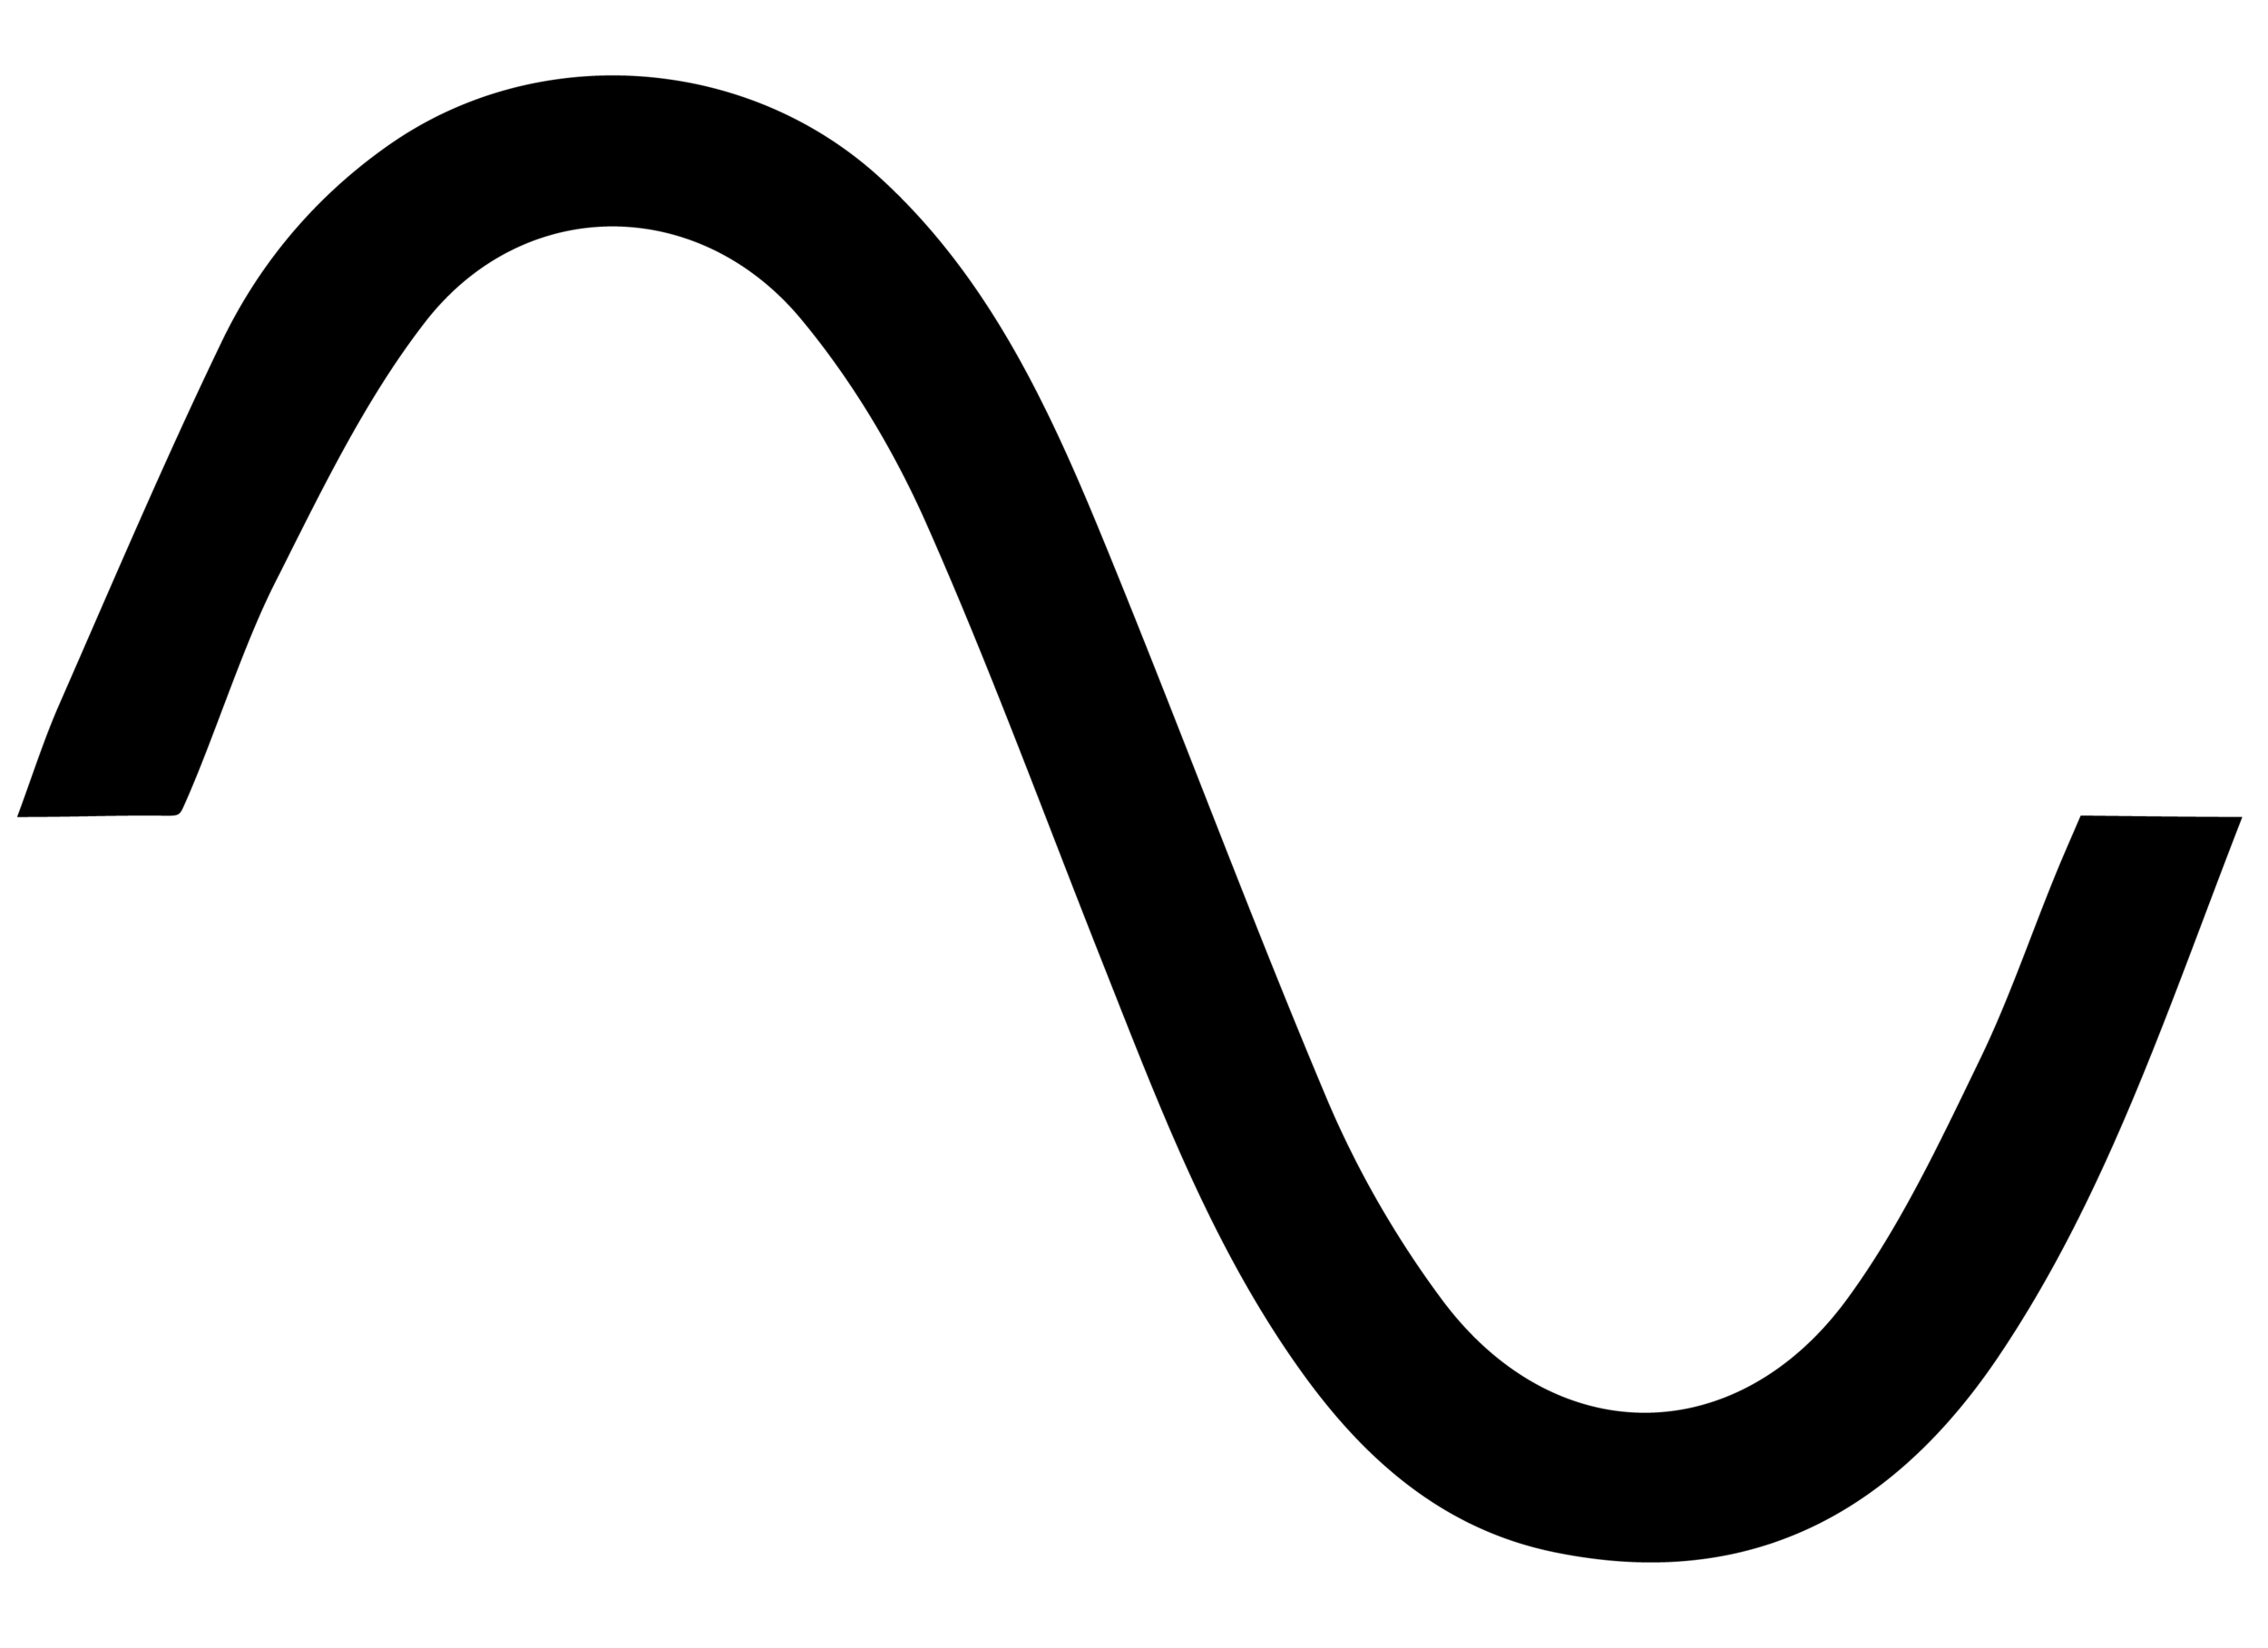 mHz logo transparent@4x.png